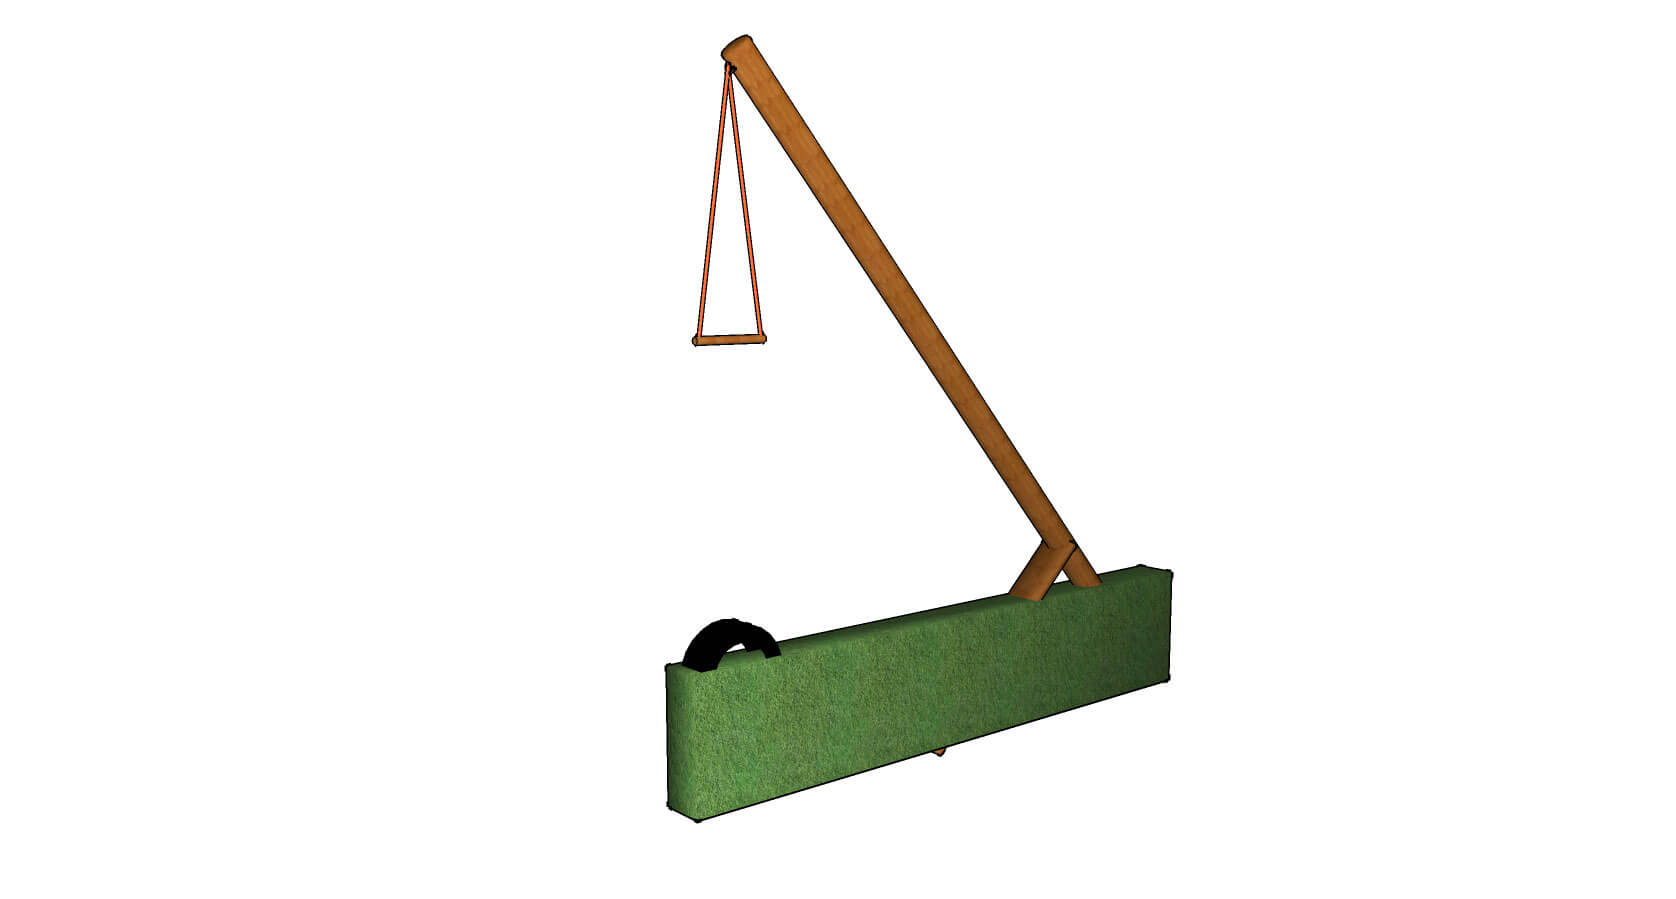 Angled Trapeze